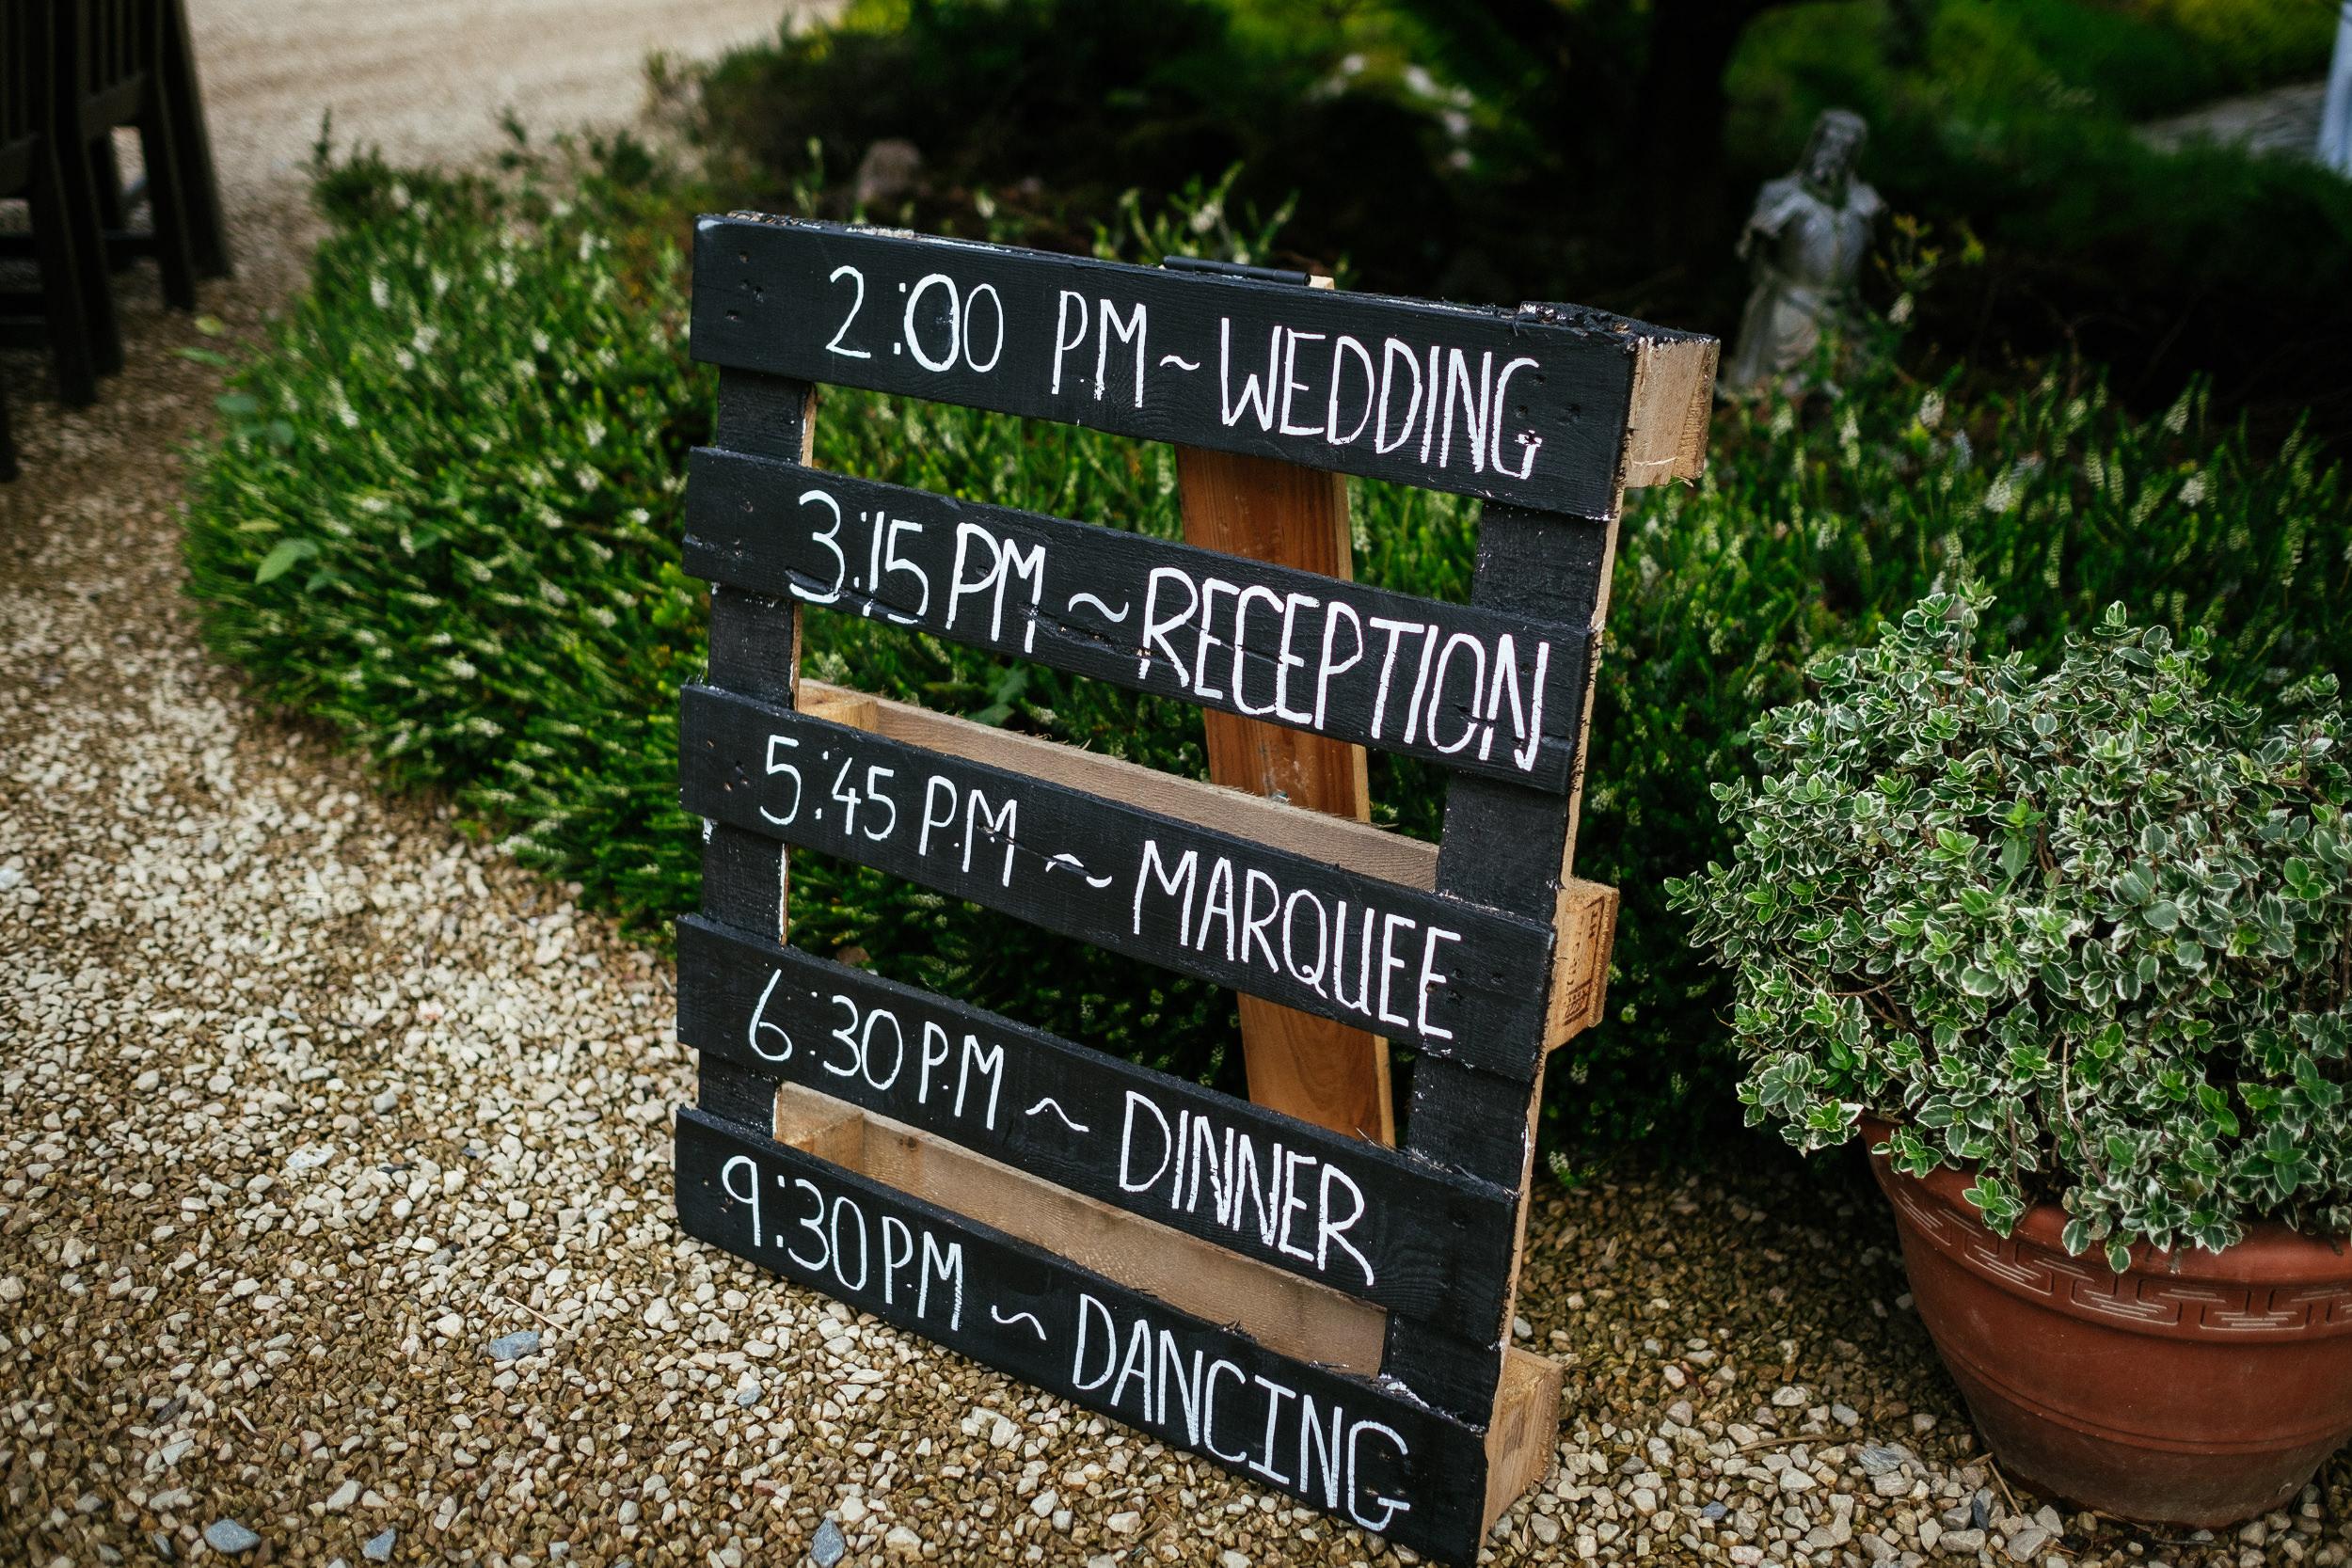 rustic notice board with wedding schedule